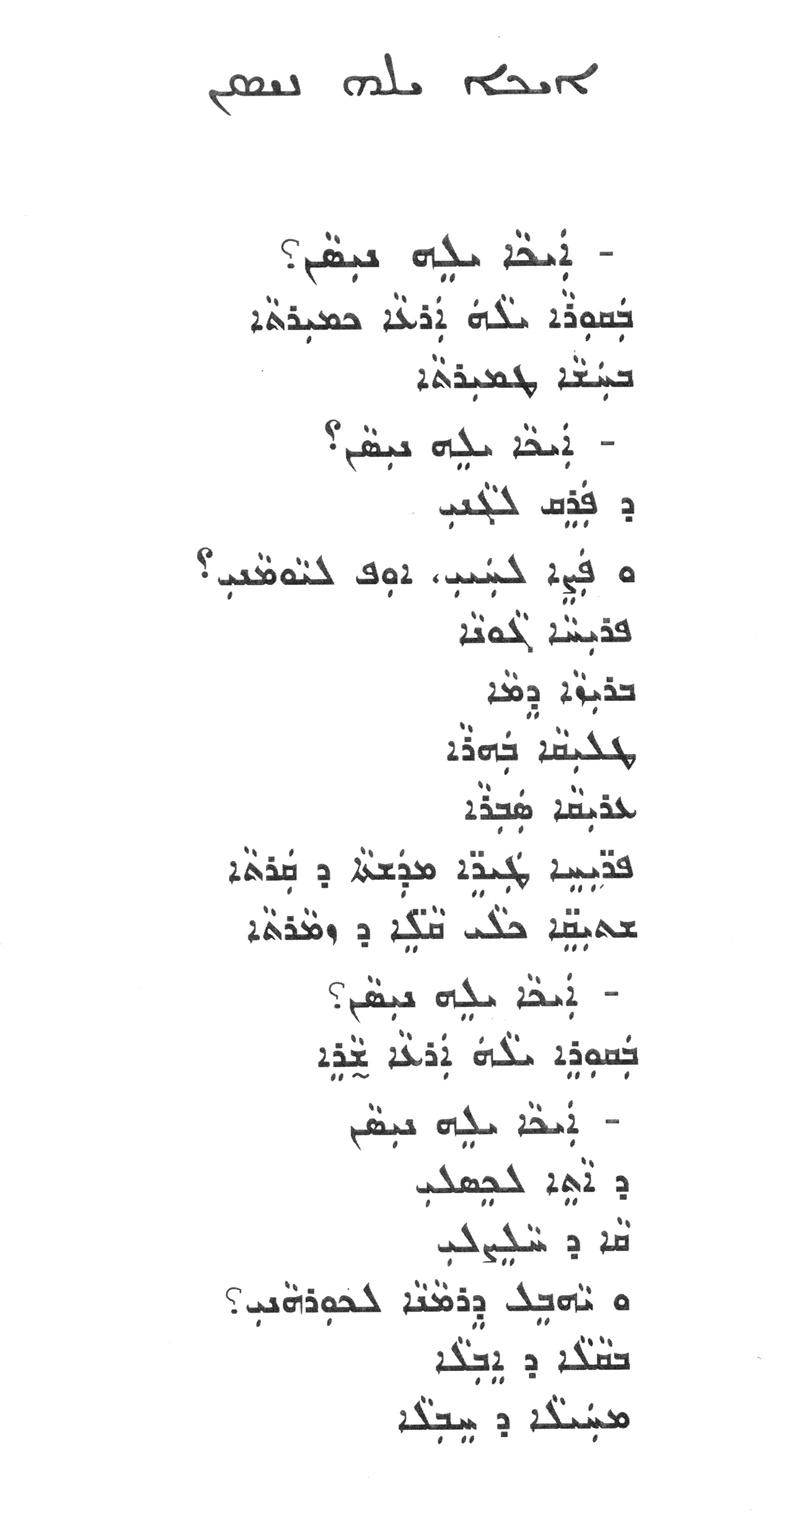 iqele nisan-1